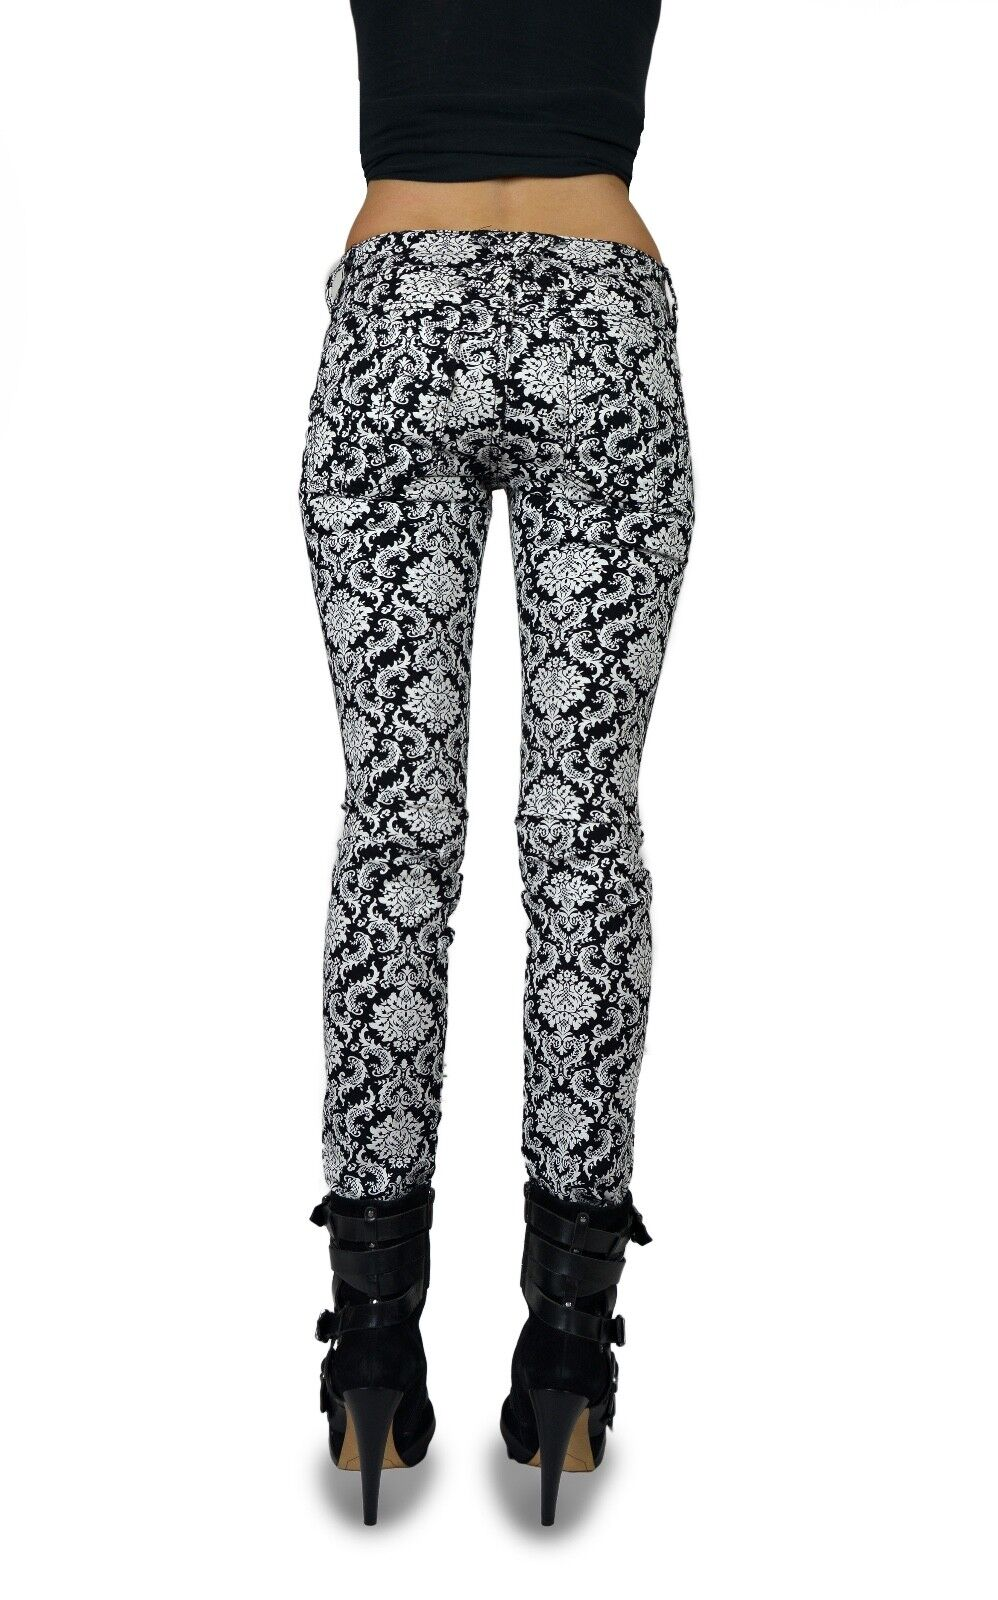 TRIPP EMO GOTH PUNK ROCKER WHITE/BLACK BROCADE JEAN PANTS SKINNY METAL IS6235P Clothing, Shoes & Accessories